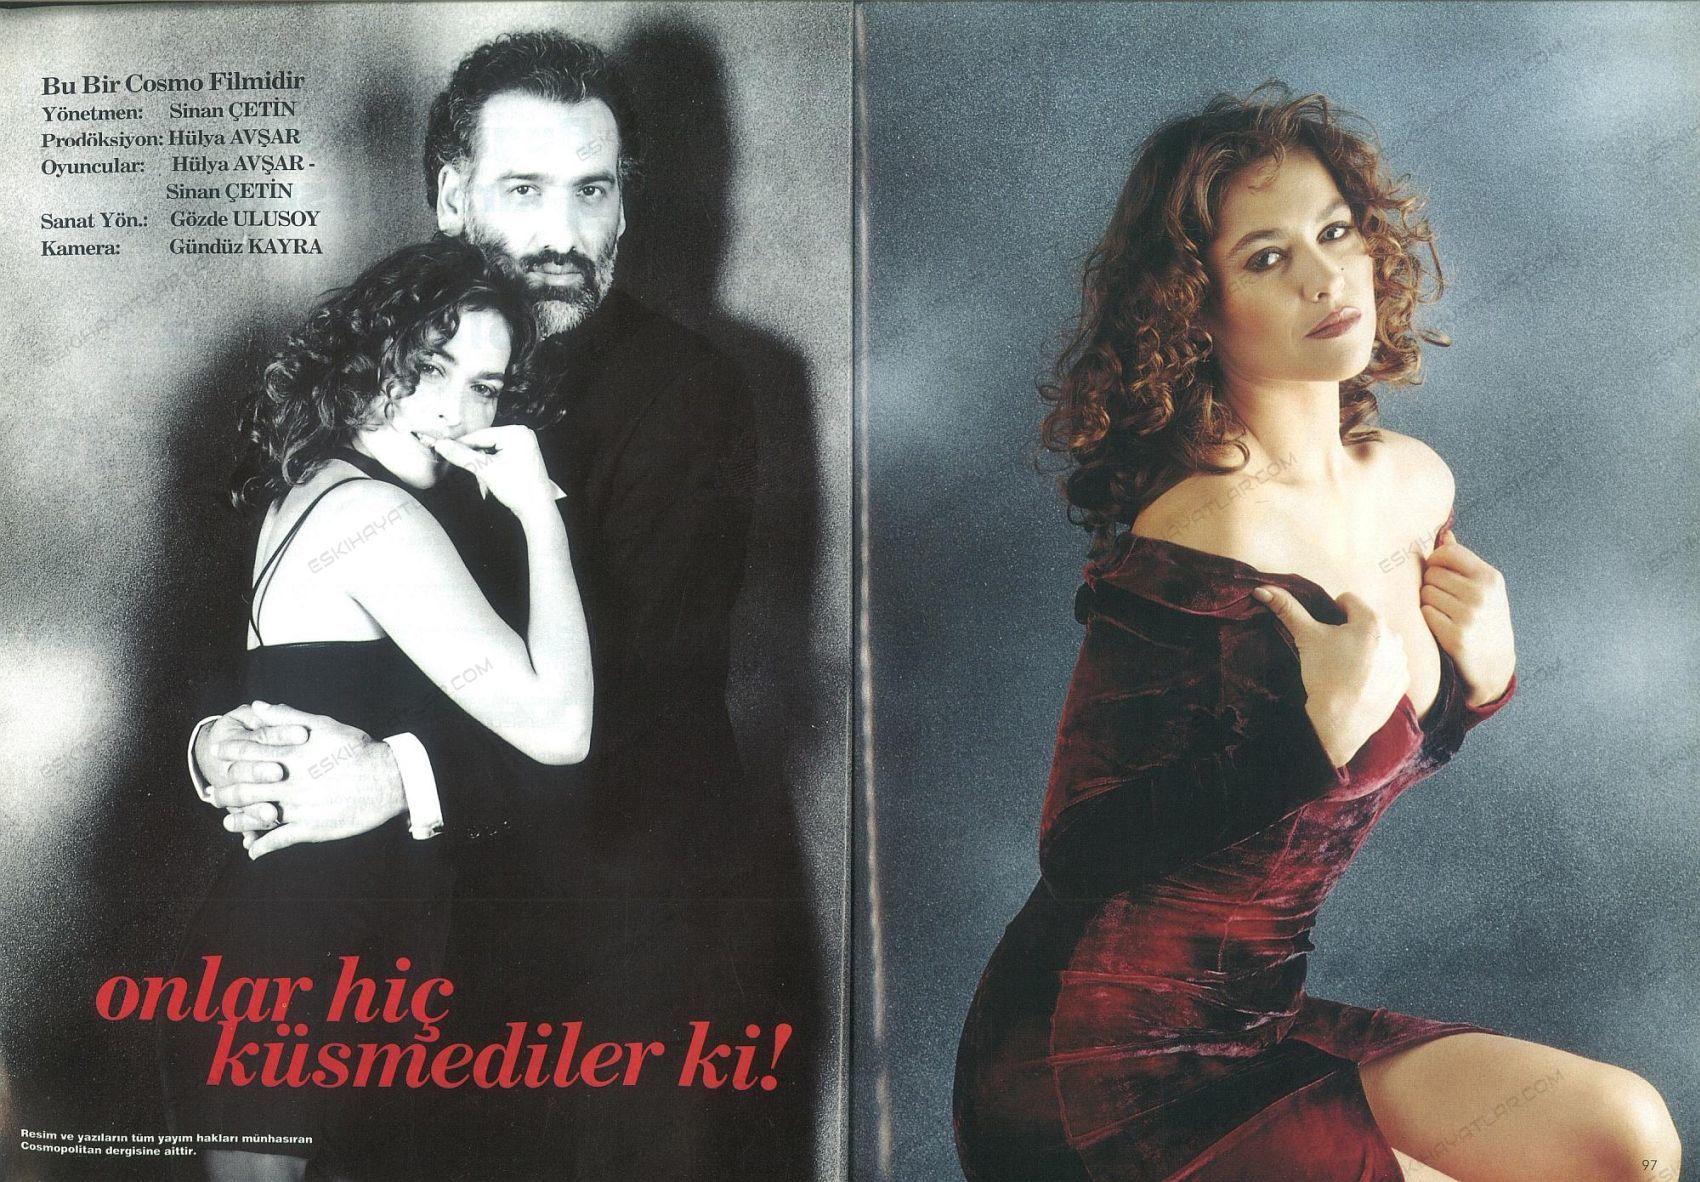 0151-cosmopolitan-1994-sinan-cetin-hulya-avsar-fotograflari (2)